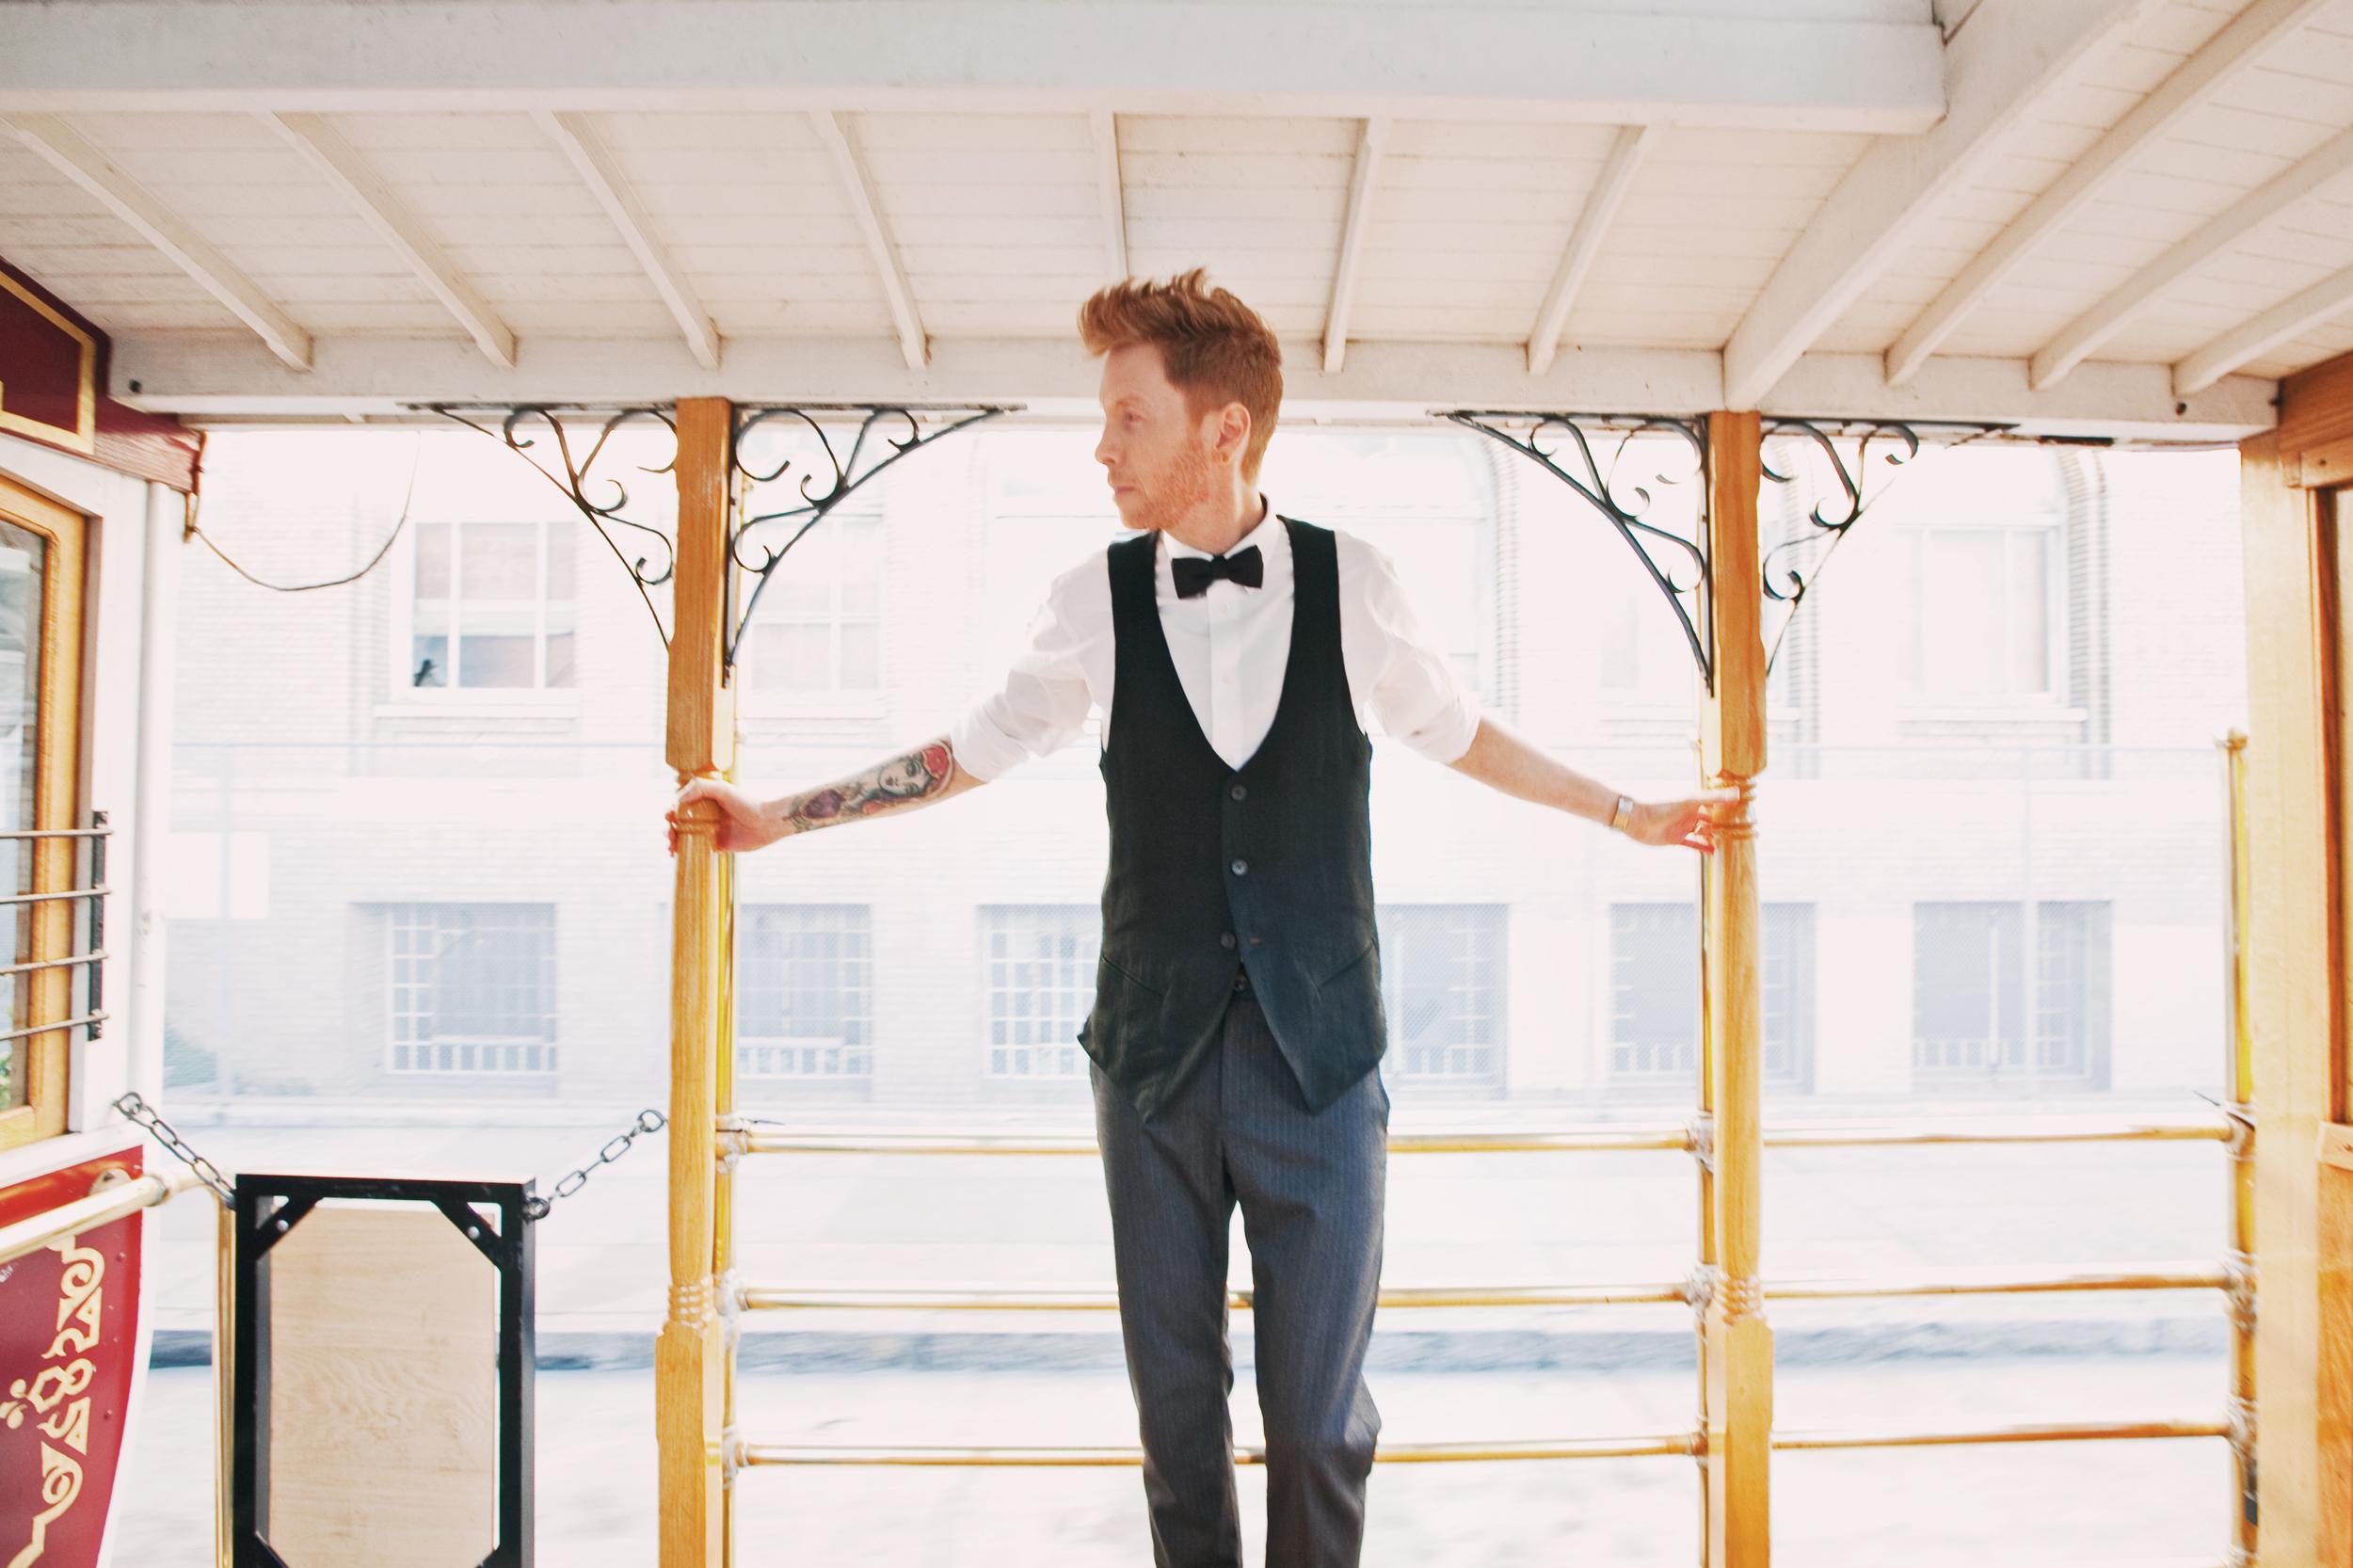 San_Francisco_City_Hall_Wedding_Photography_Cori_EB-19.JPG